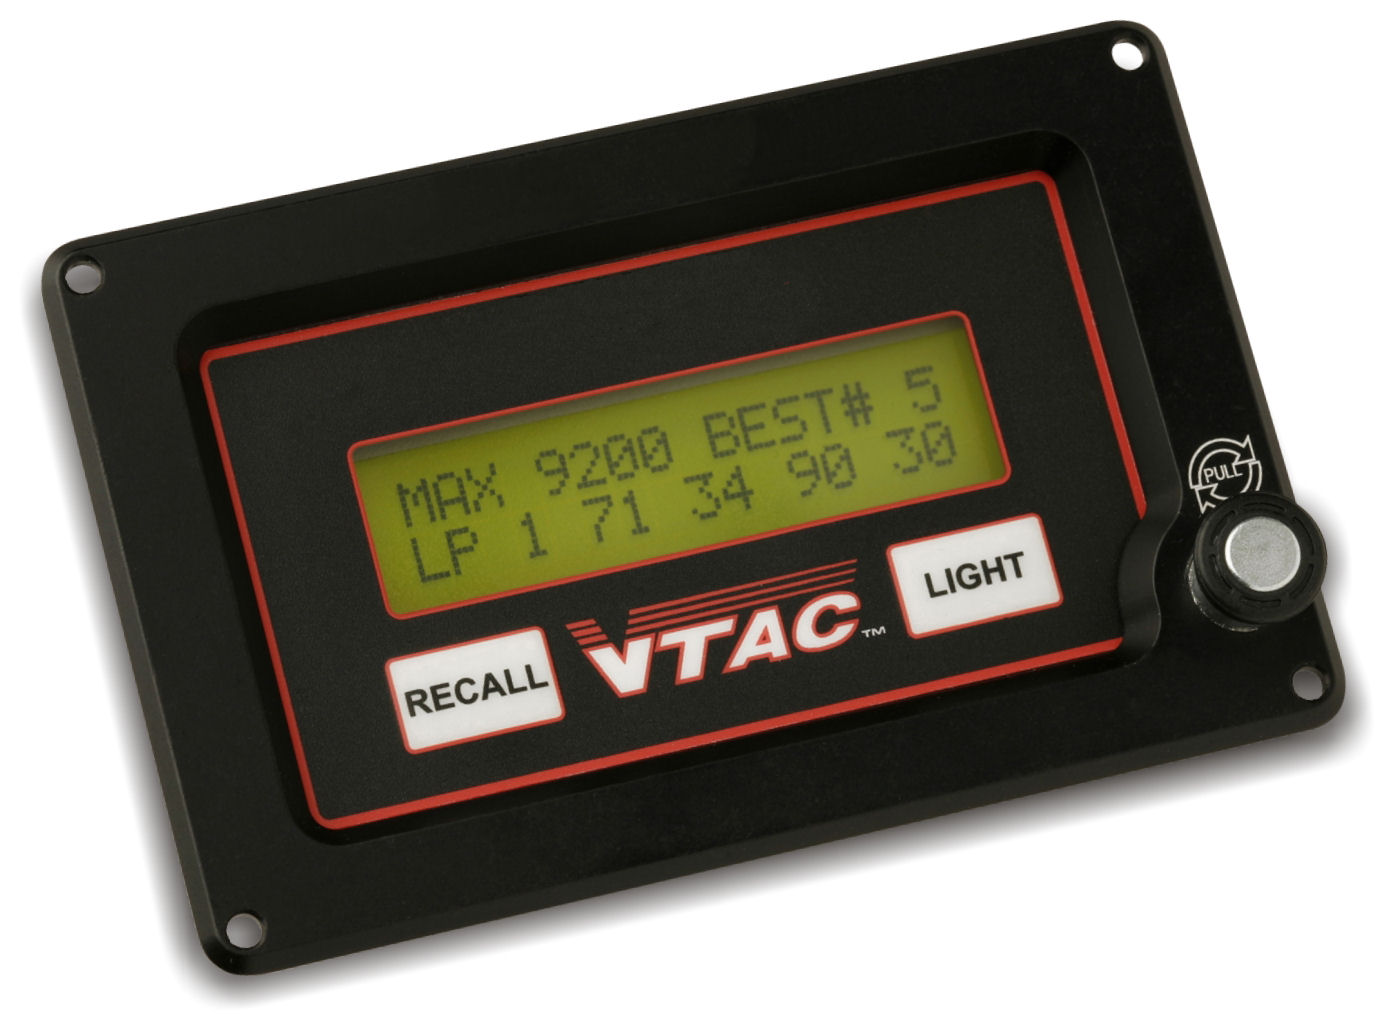 tel tac oval track pro, tel tac 2 troubleshooting, tel tach ii, on tel tac wiring diagram magneto